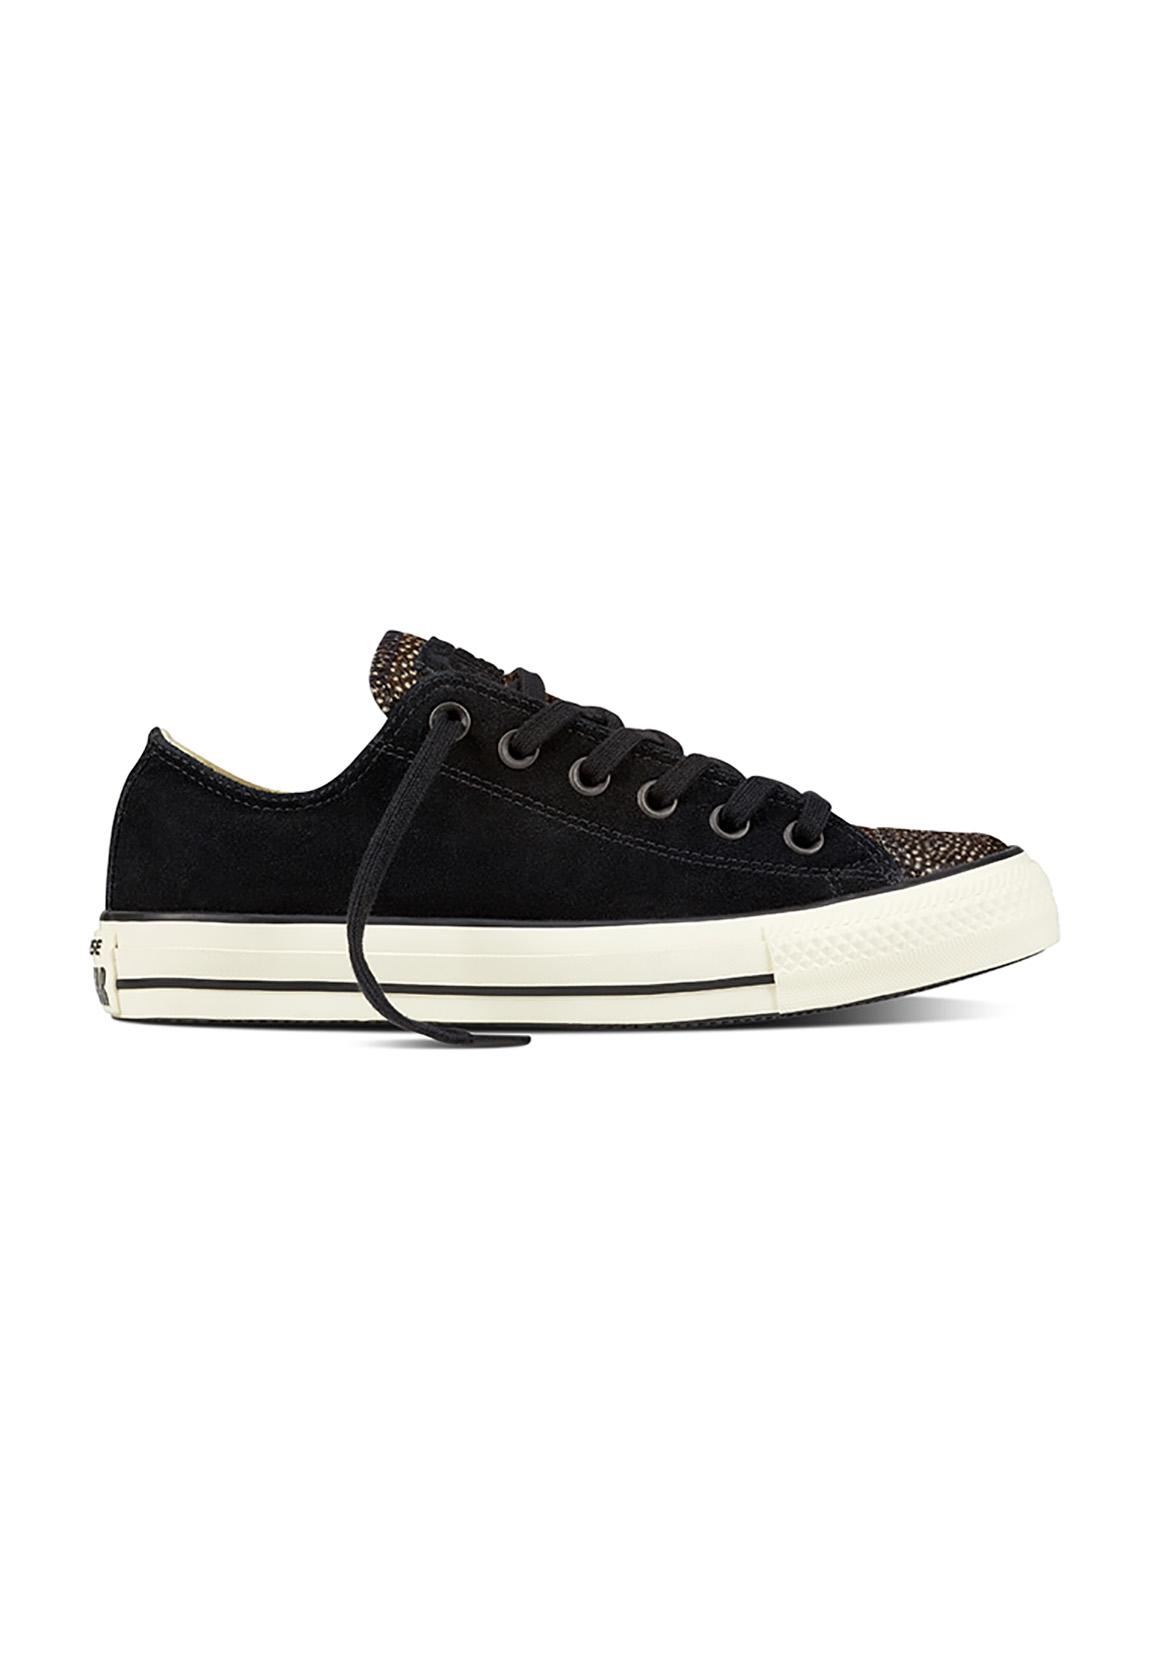 Details about Converse Chucks Low CT as Ox 157666C Black